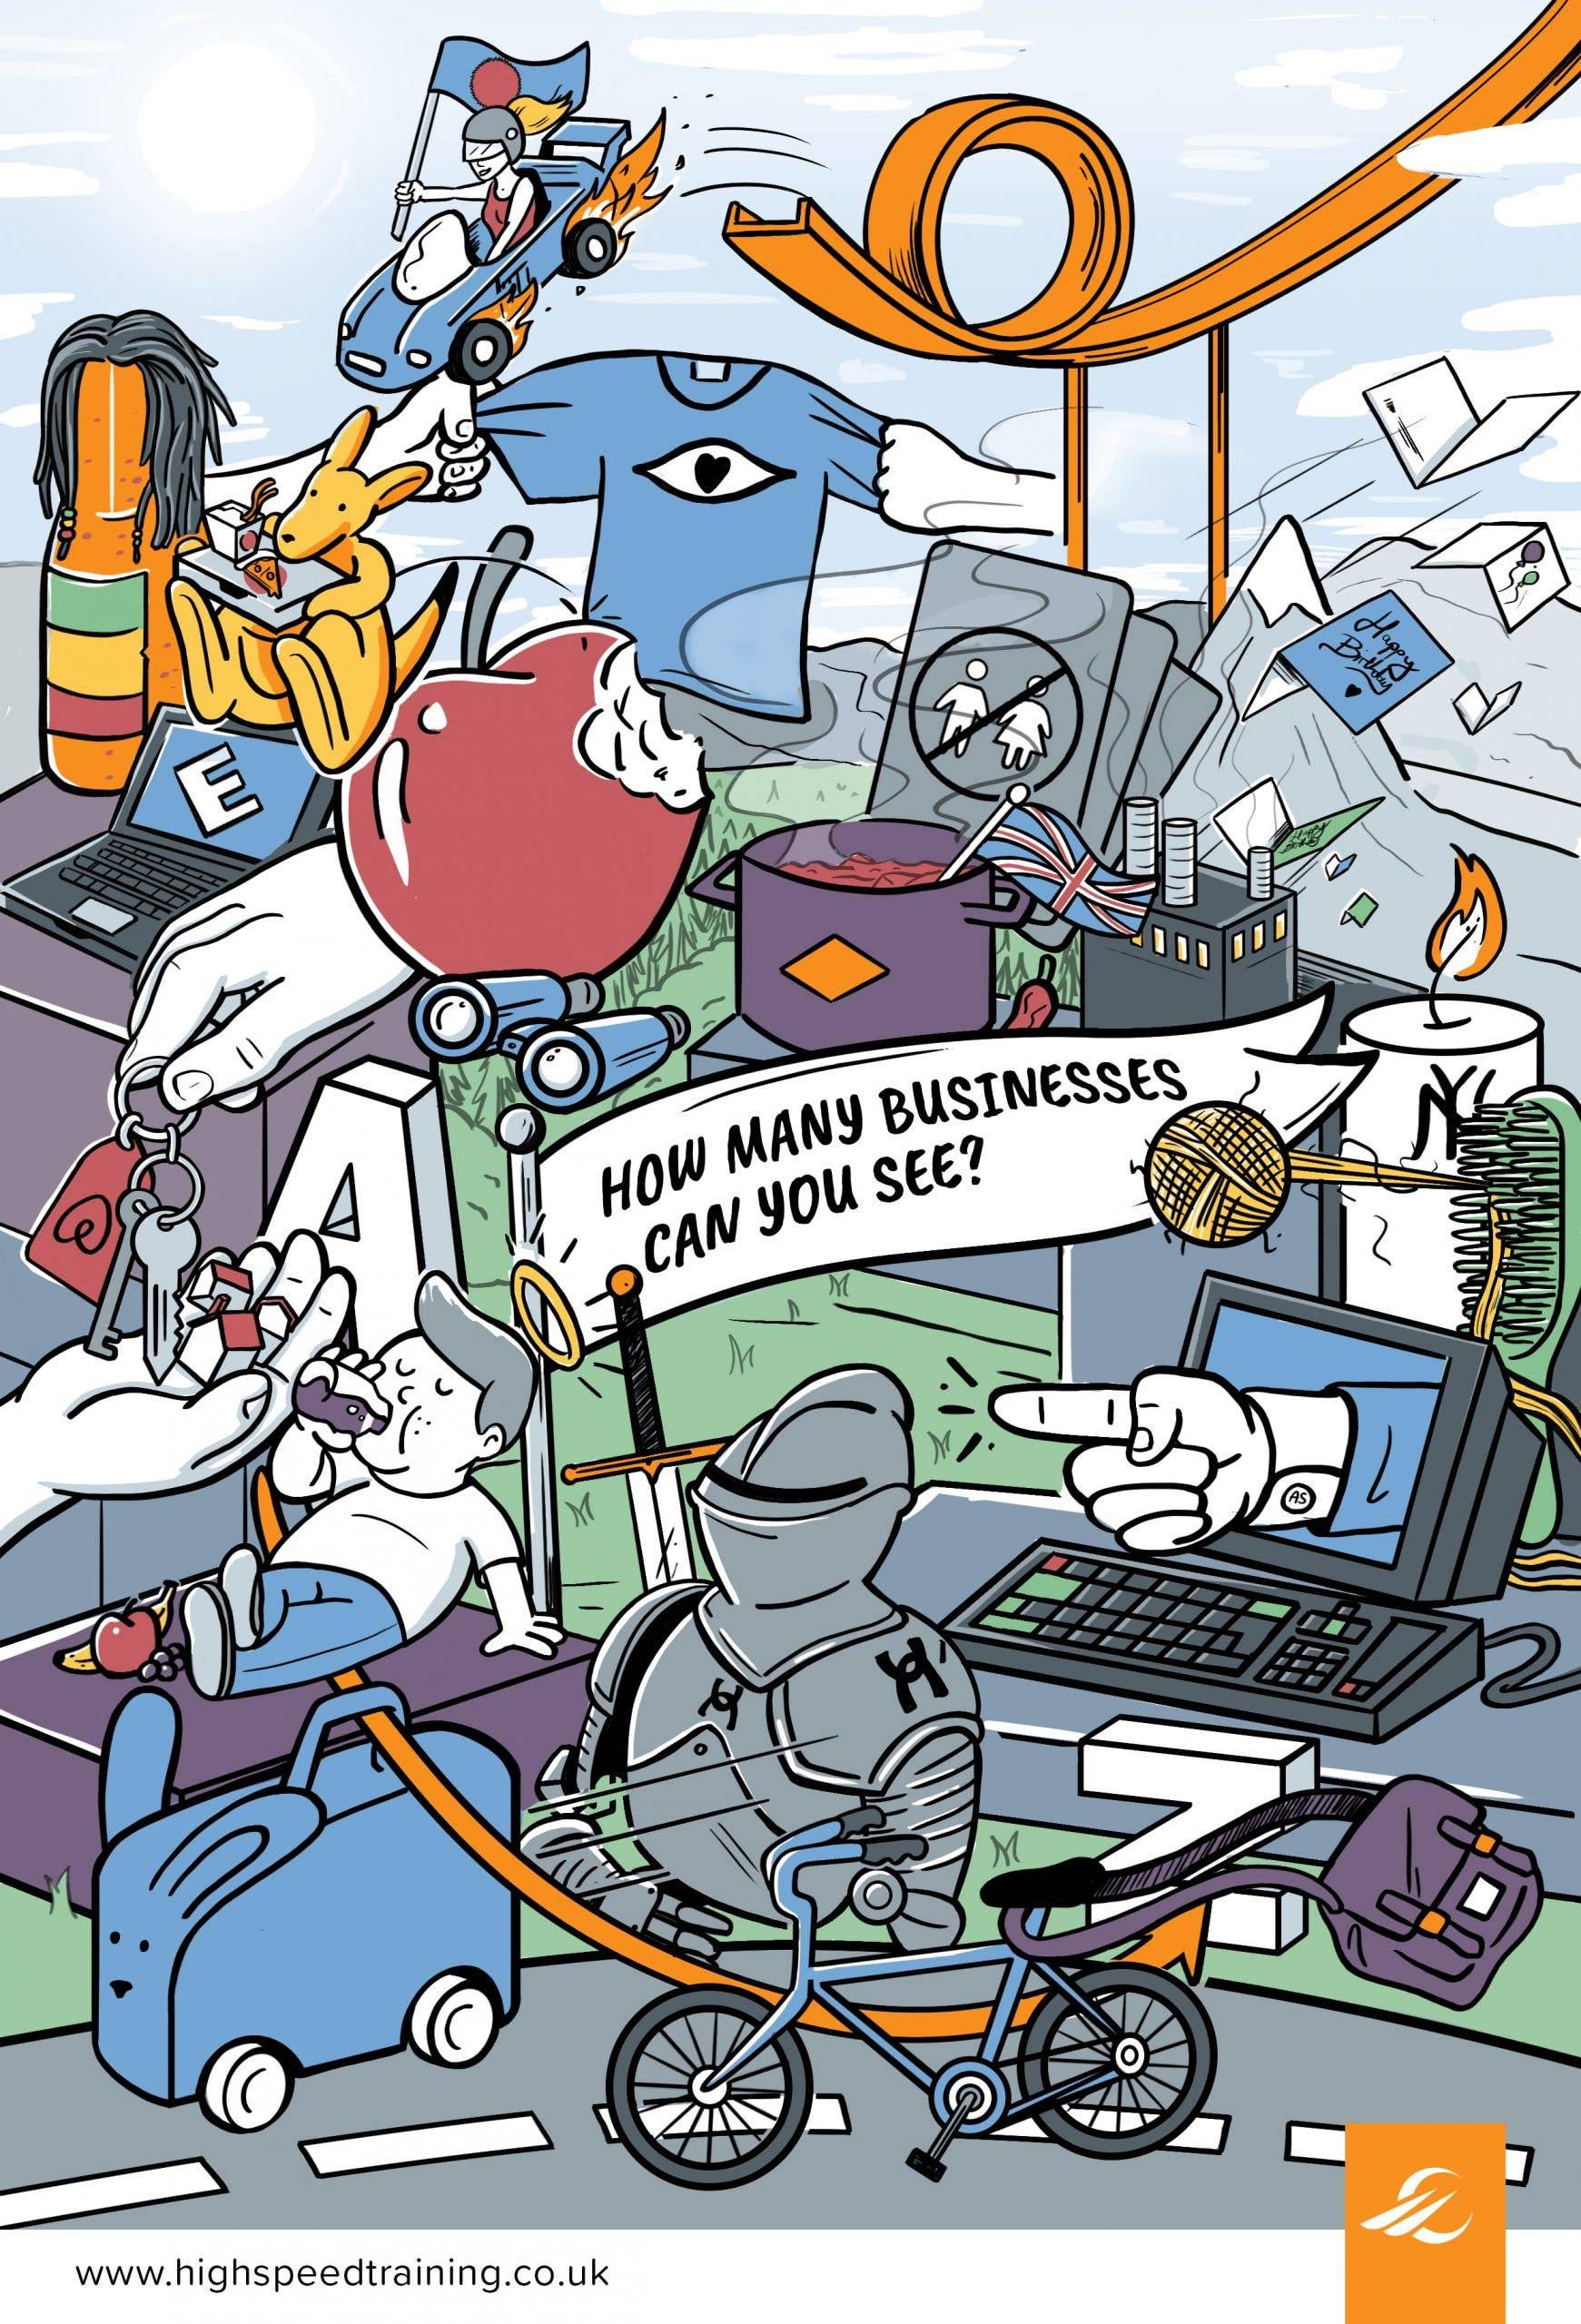 Business brain teaser